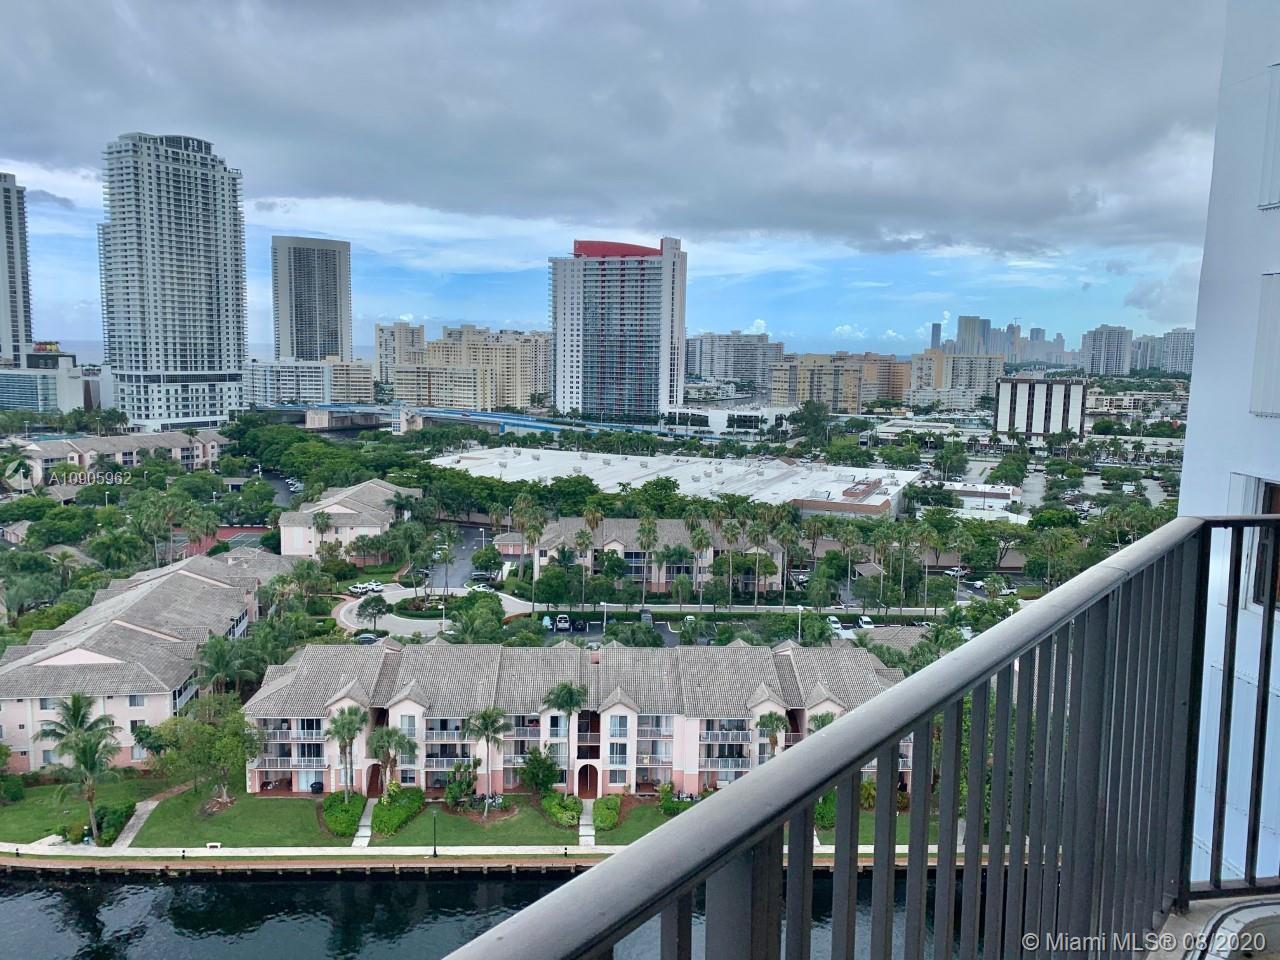 Photo of 300 Three Islands Blvd #618, Hallandale Beach, Florida, 33009 - BALCONY VIEW!